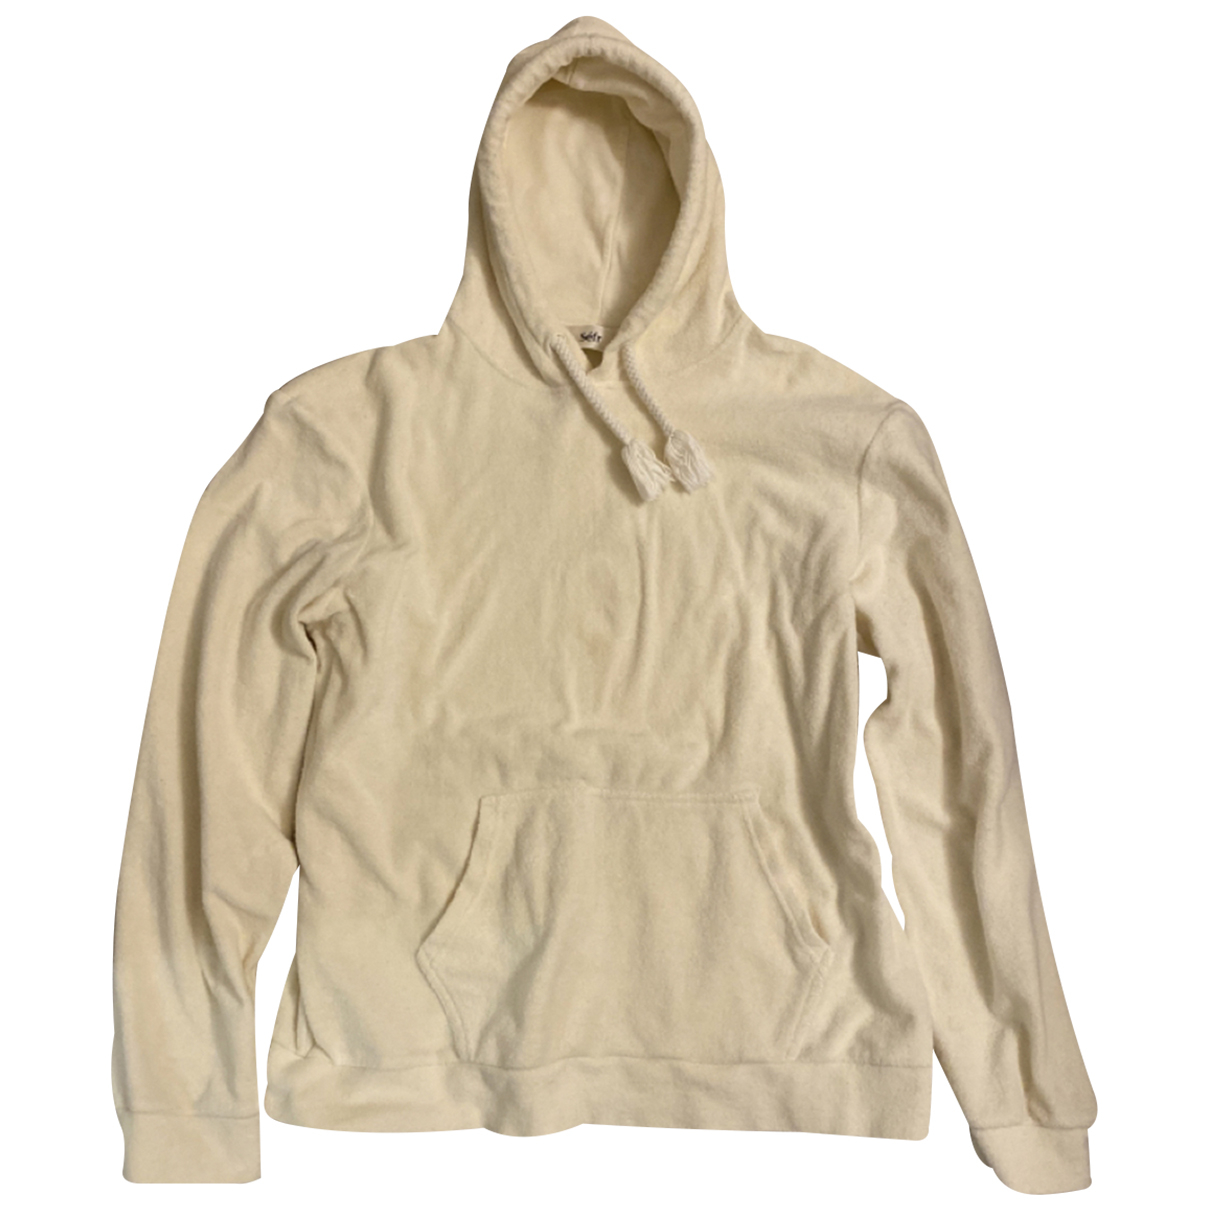 Séfr N Yellow Cotton Knitwear & Sweatshirts for Men XL International